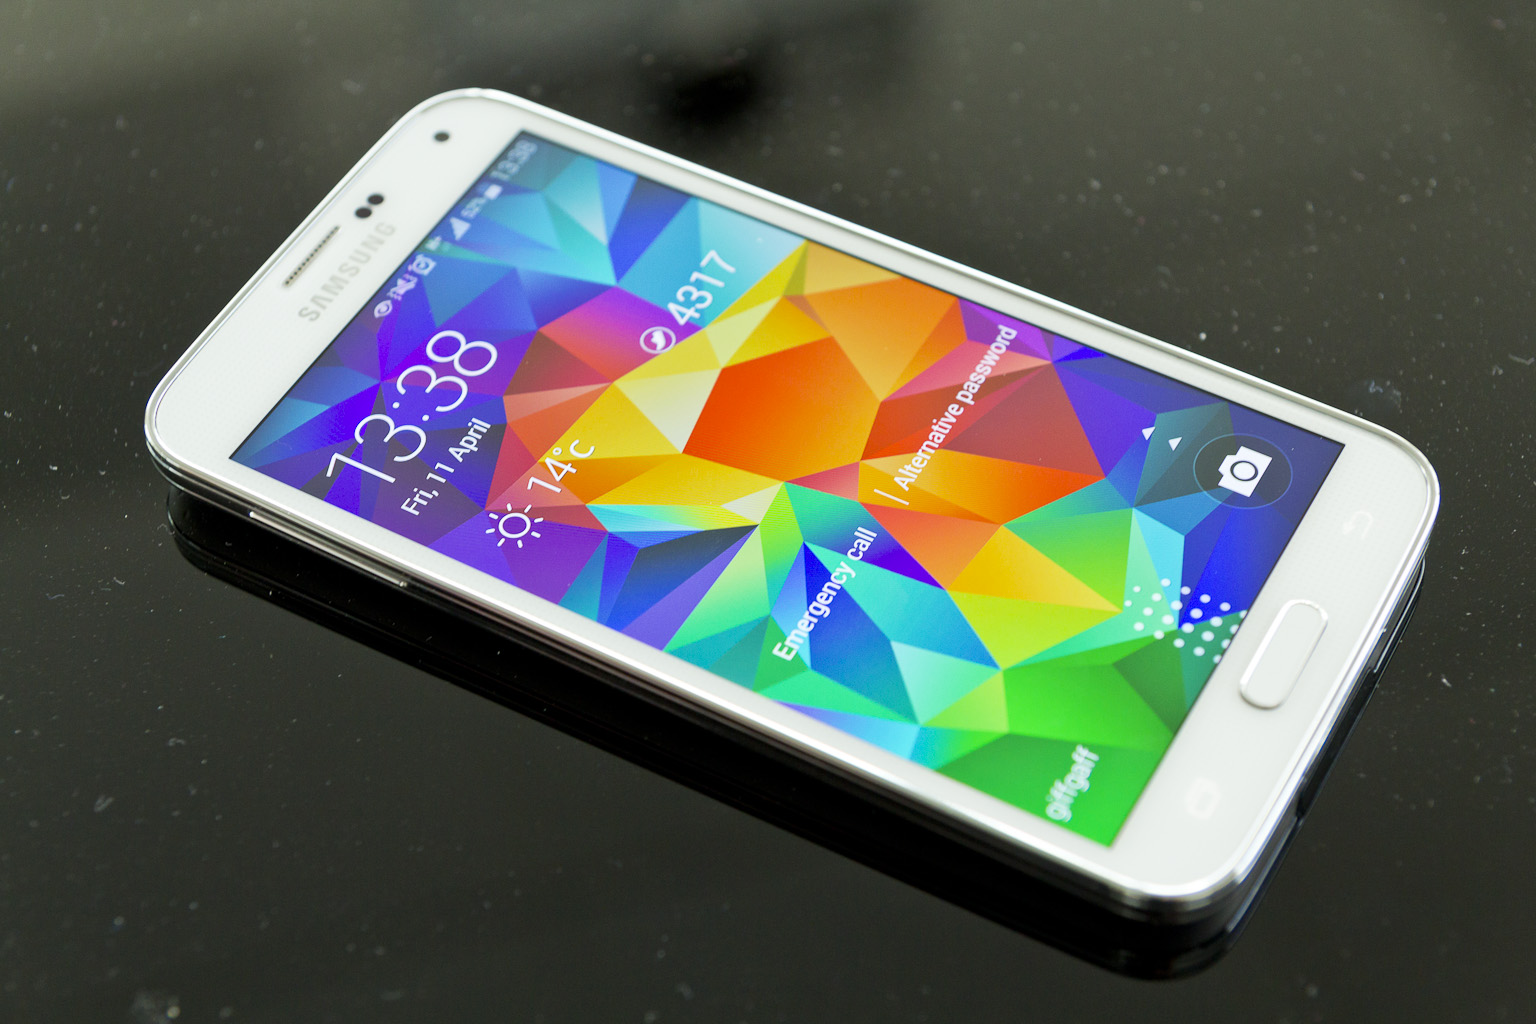 Samsung_Galaxy_S5_lock_screen (1)